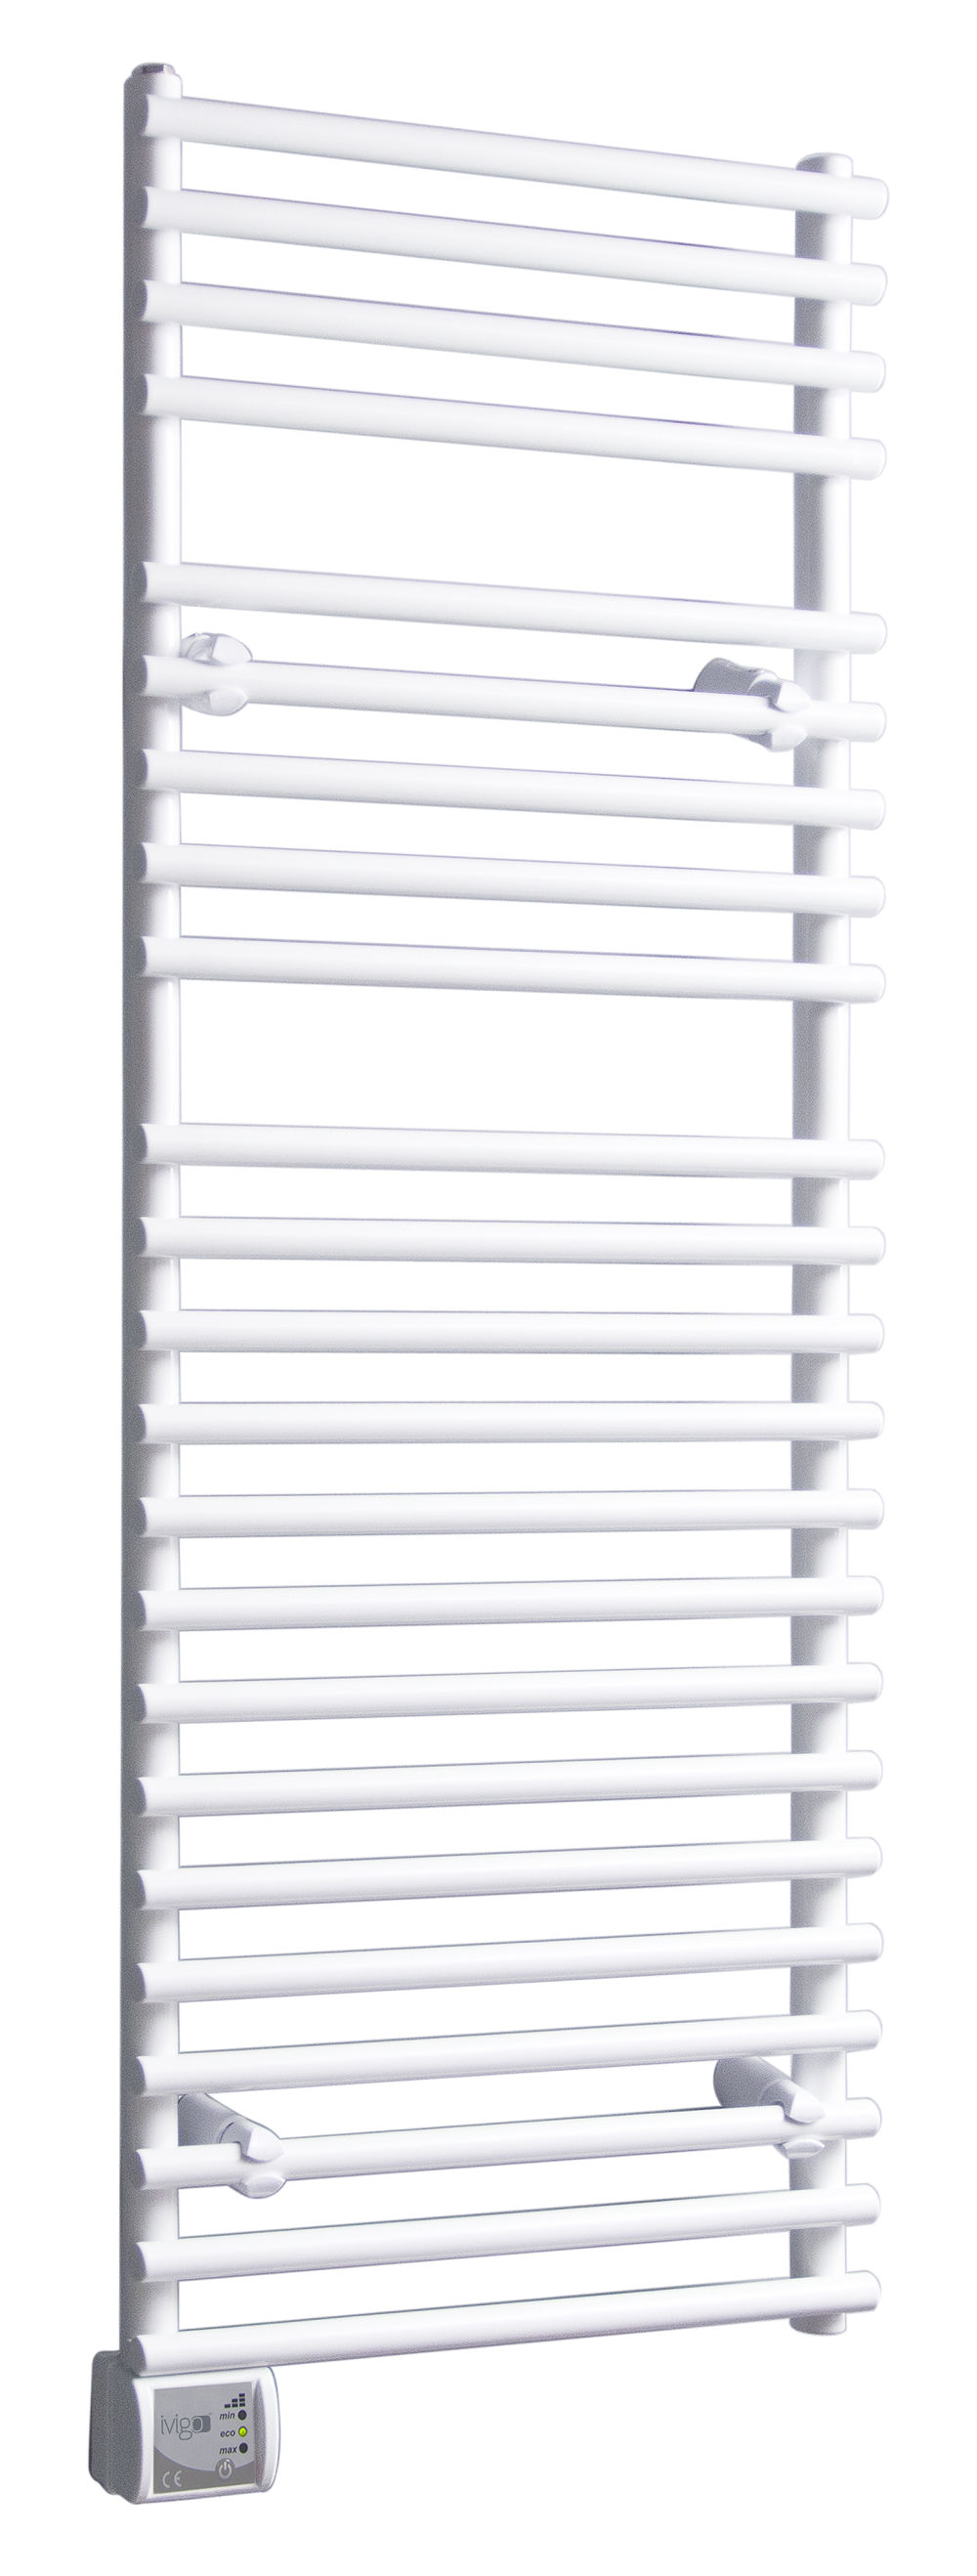 Radiator (calorifer) baie portprosop electric iVigo EHR 5023, 600 W, 500x1200 mm, culoare alb imagine fornello.ro